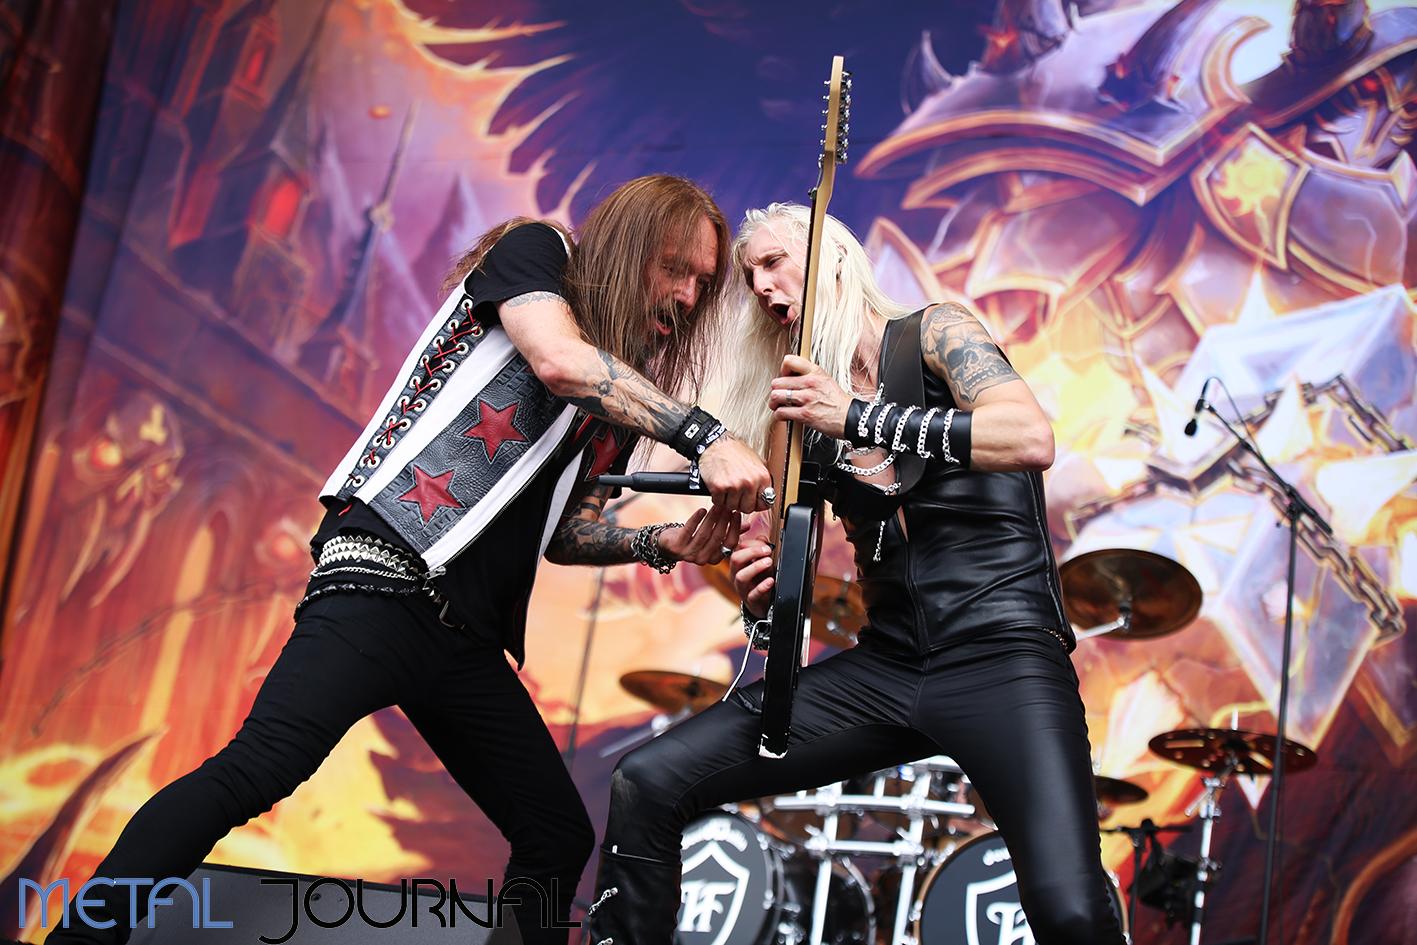 hammerfall - metal journal rock fest barcelona 2019 pic 4